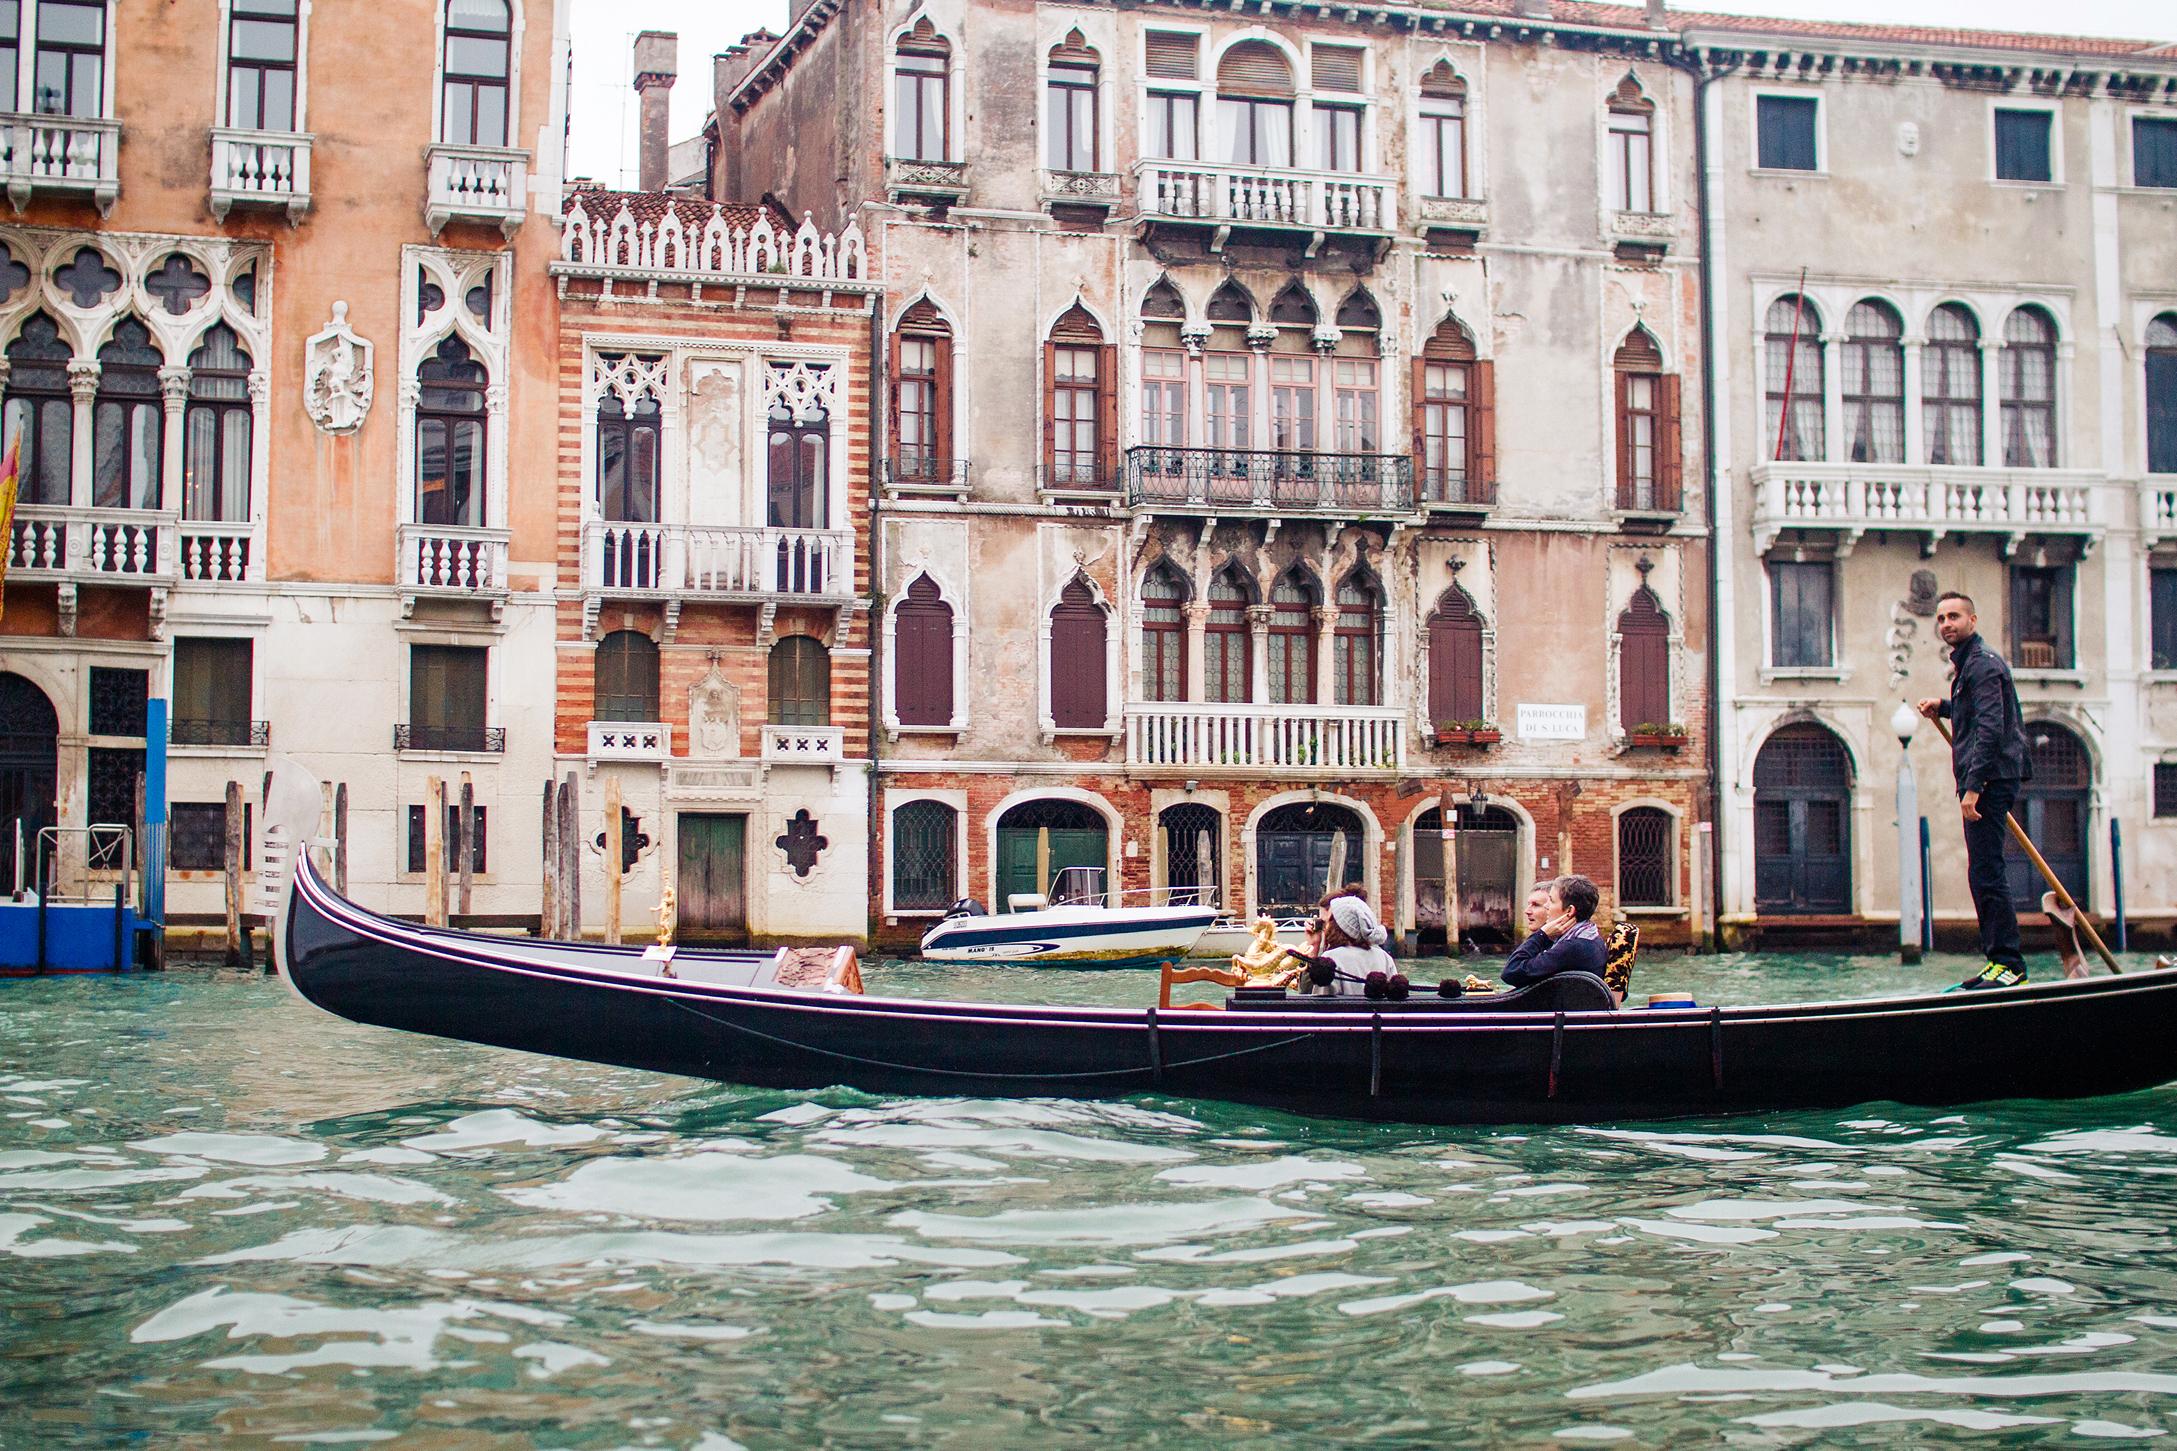 Exploring Venice: Tour Through its Streets & Canals | Walks